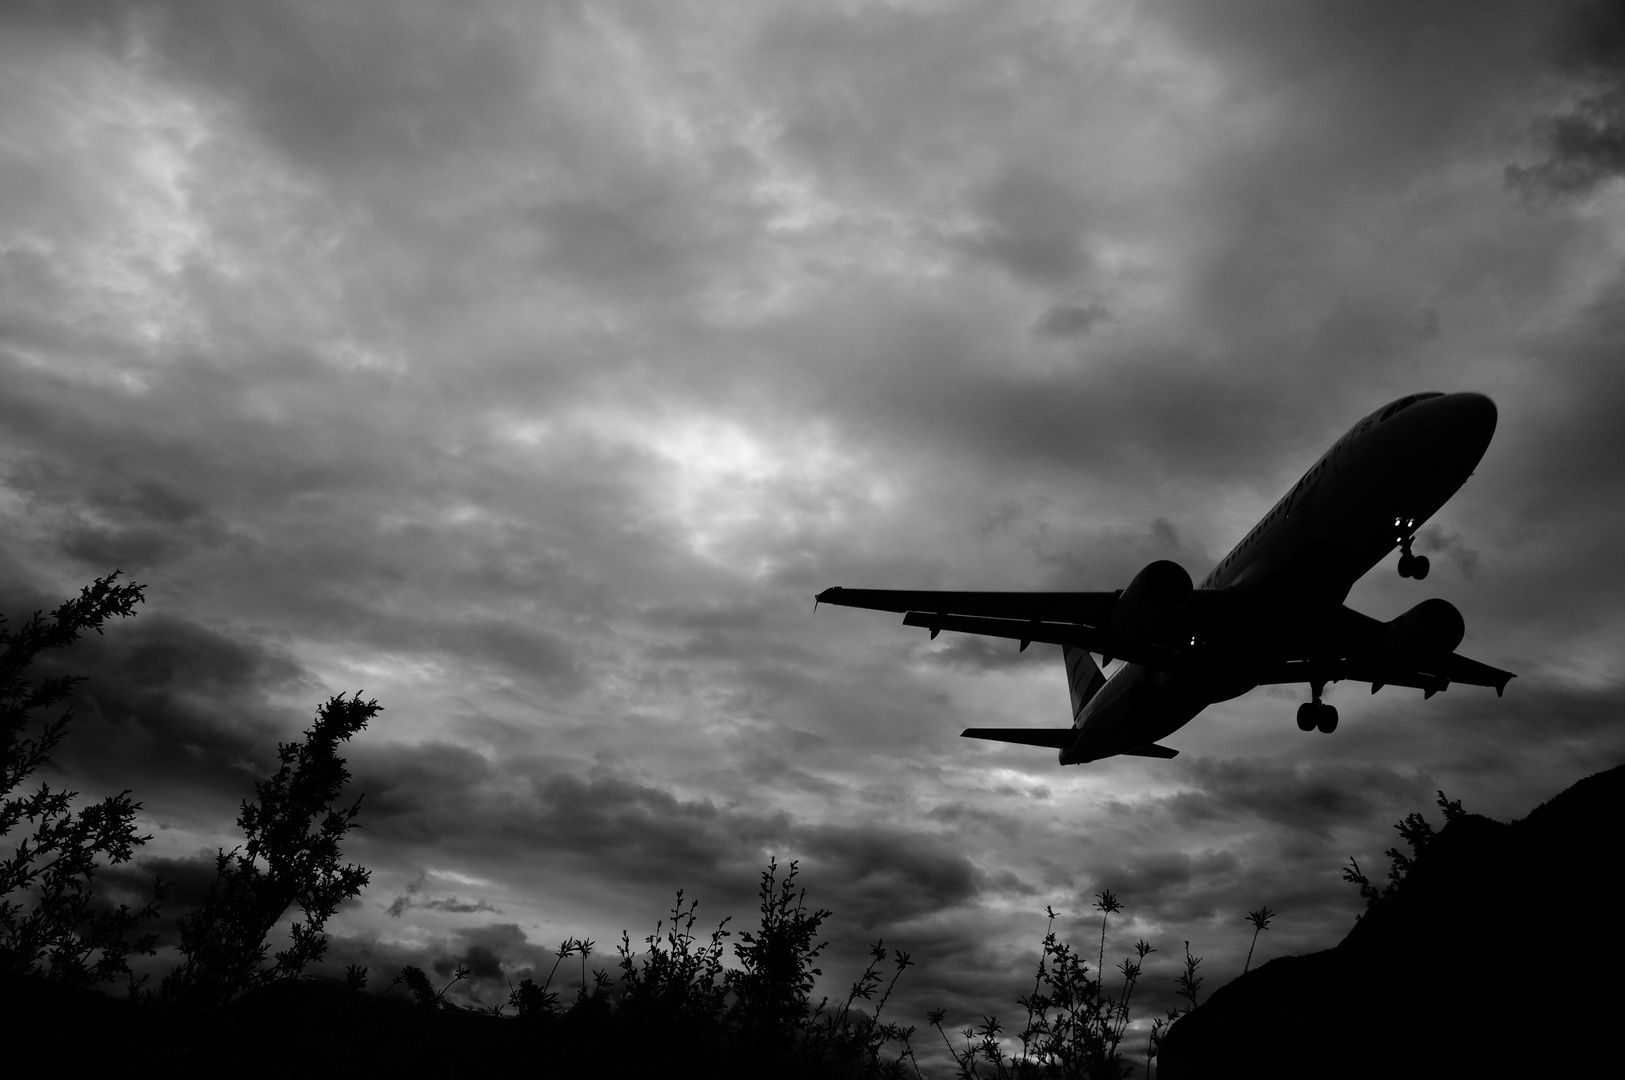 Landing in the sunset